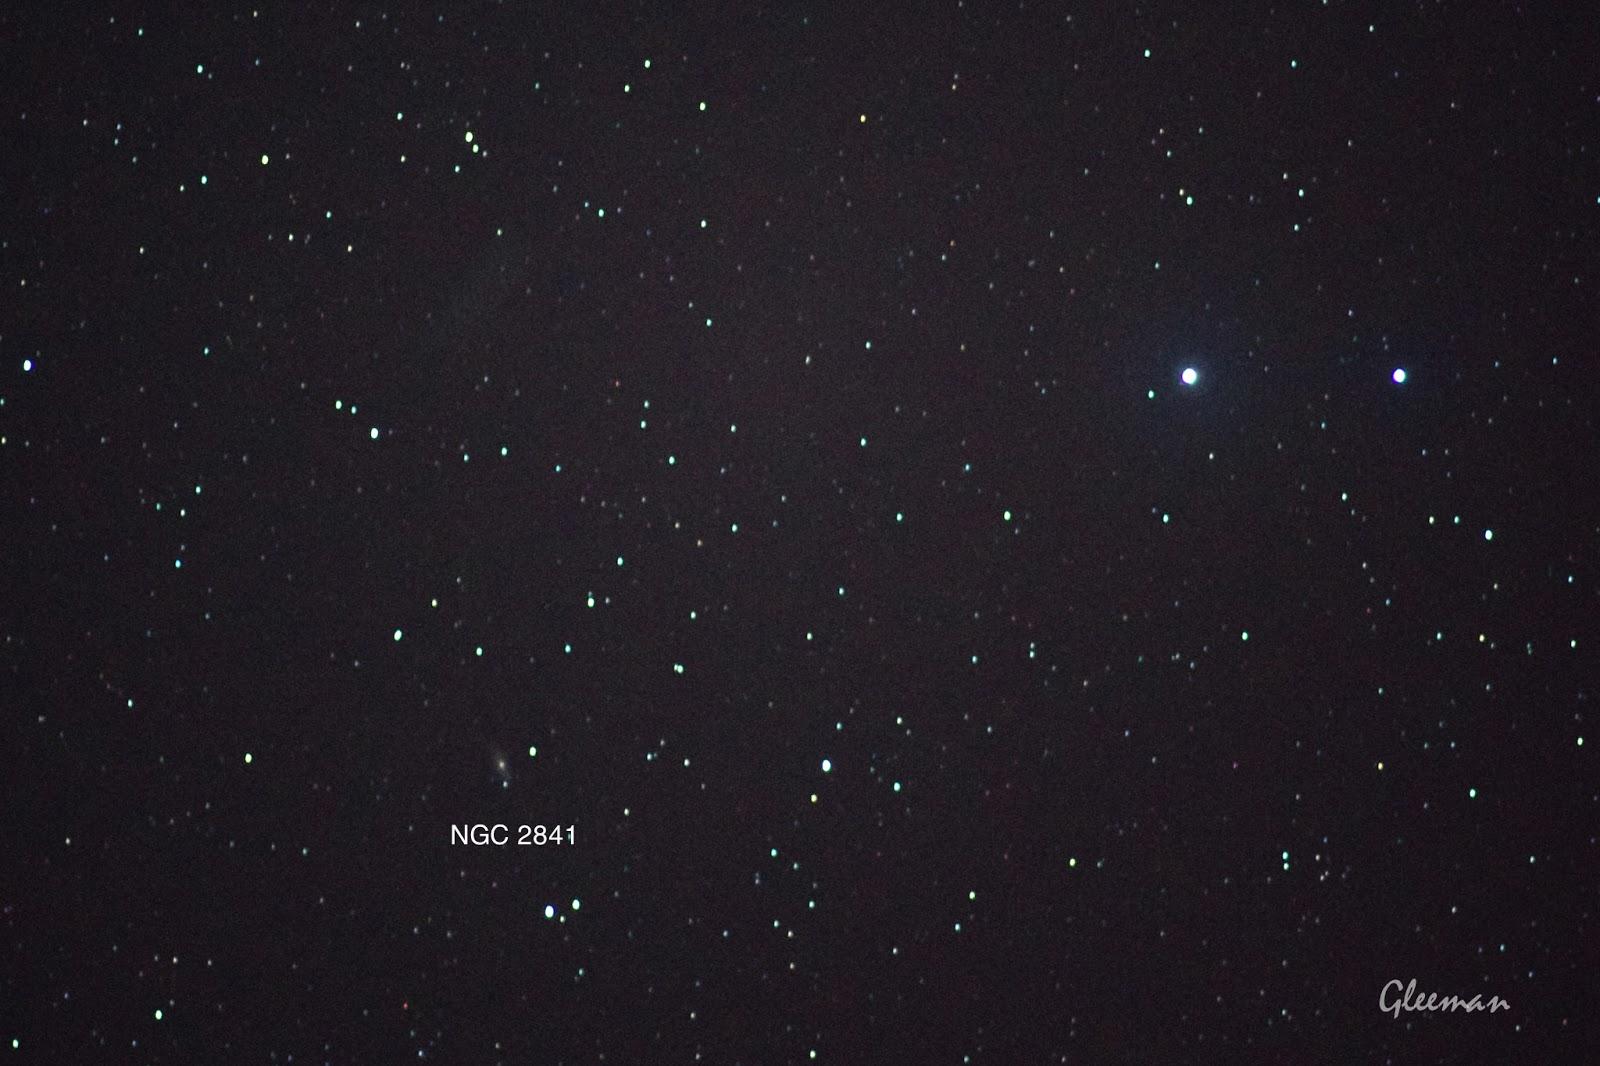 NGC 2841/ Pentax  K5 + Pentax O-GPS1 + DA*200